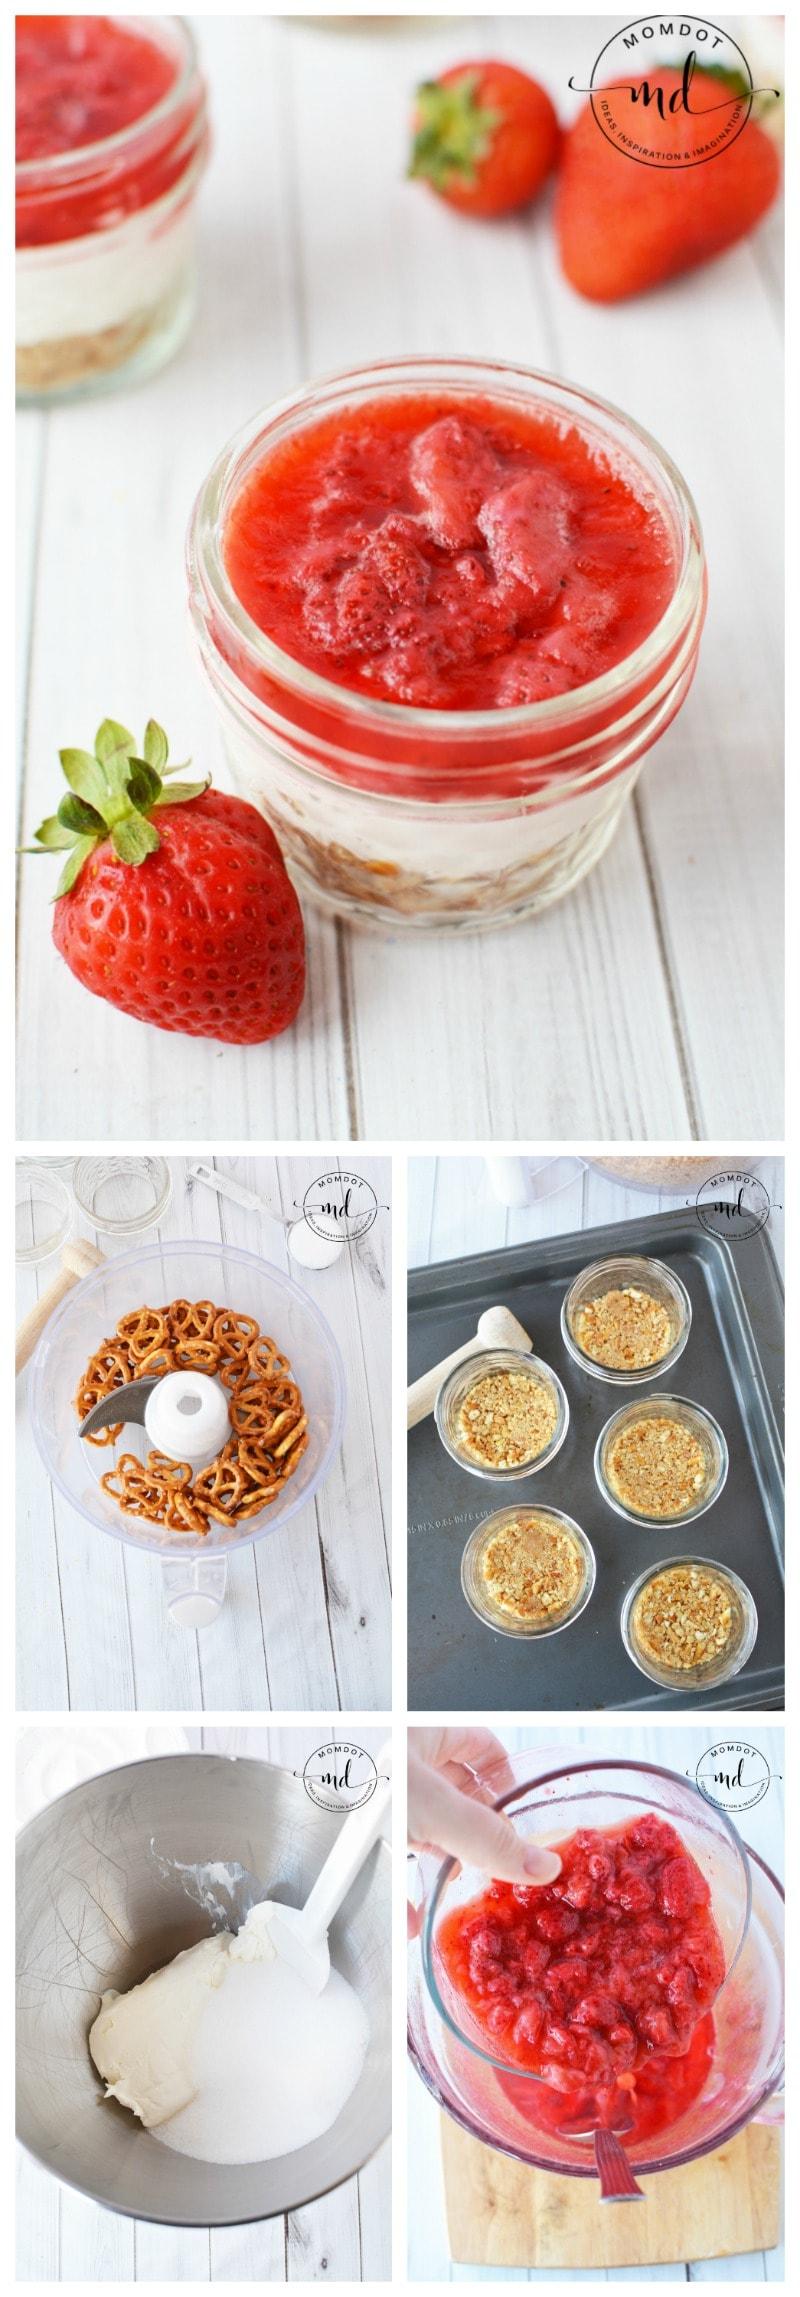 Strawberry Pretzel Dessert Jars | Easy Dessert perfect for holiday Season , Substitute for Cranberries!